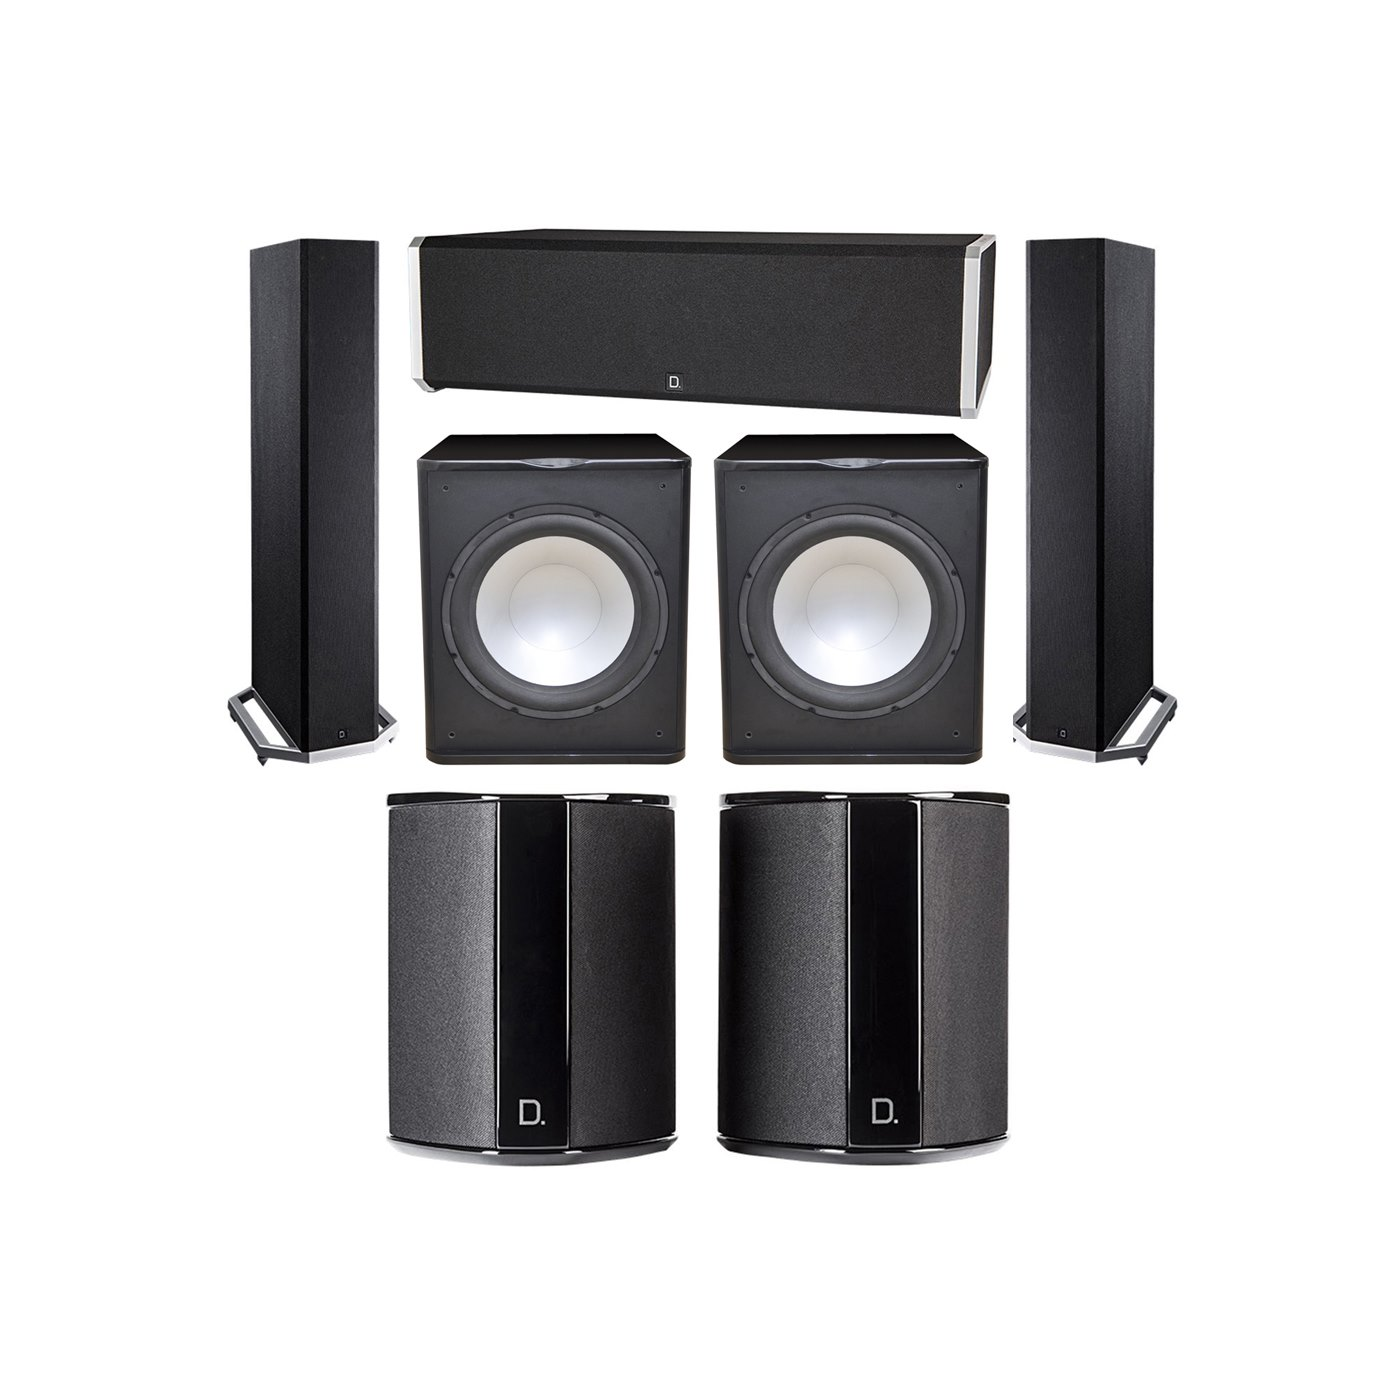 Definitive Technology 5.2 System with 2 BP9020 Tower Speakers, 1 CS9040 Center Channel Speaker, 2 SR9040 Surround Speaker, 2 Premier Acoustic PA-150 Subwoofer